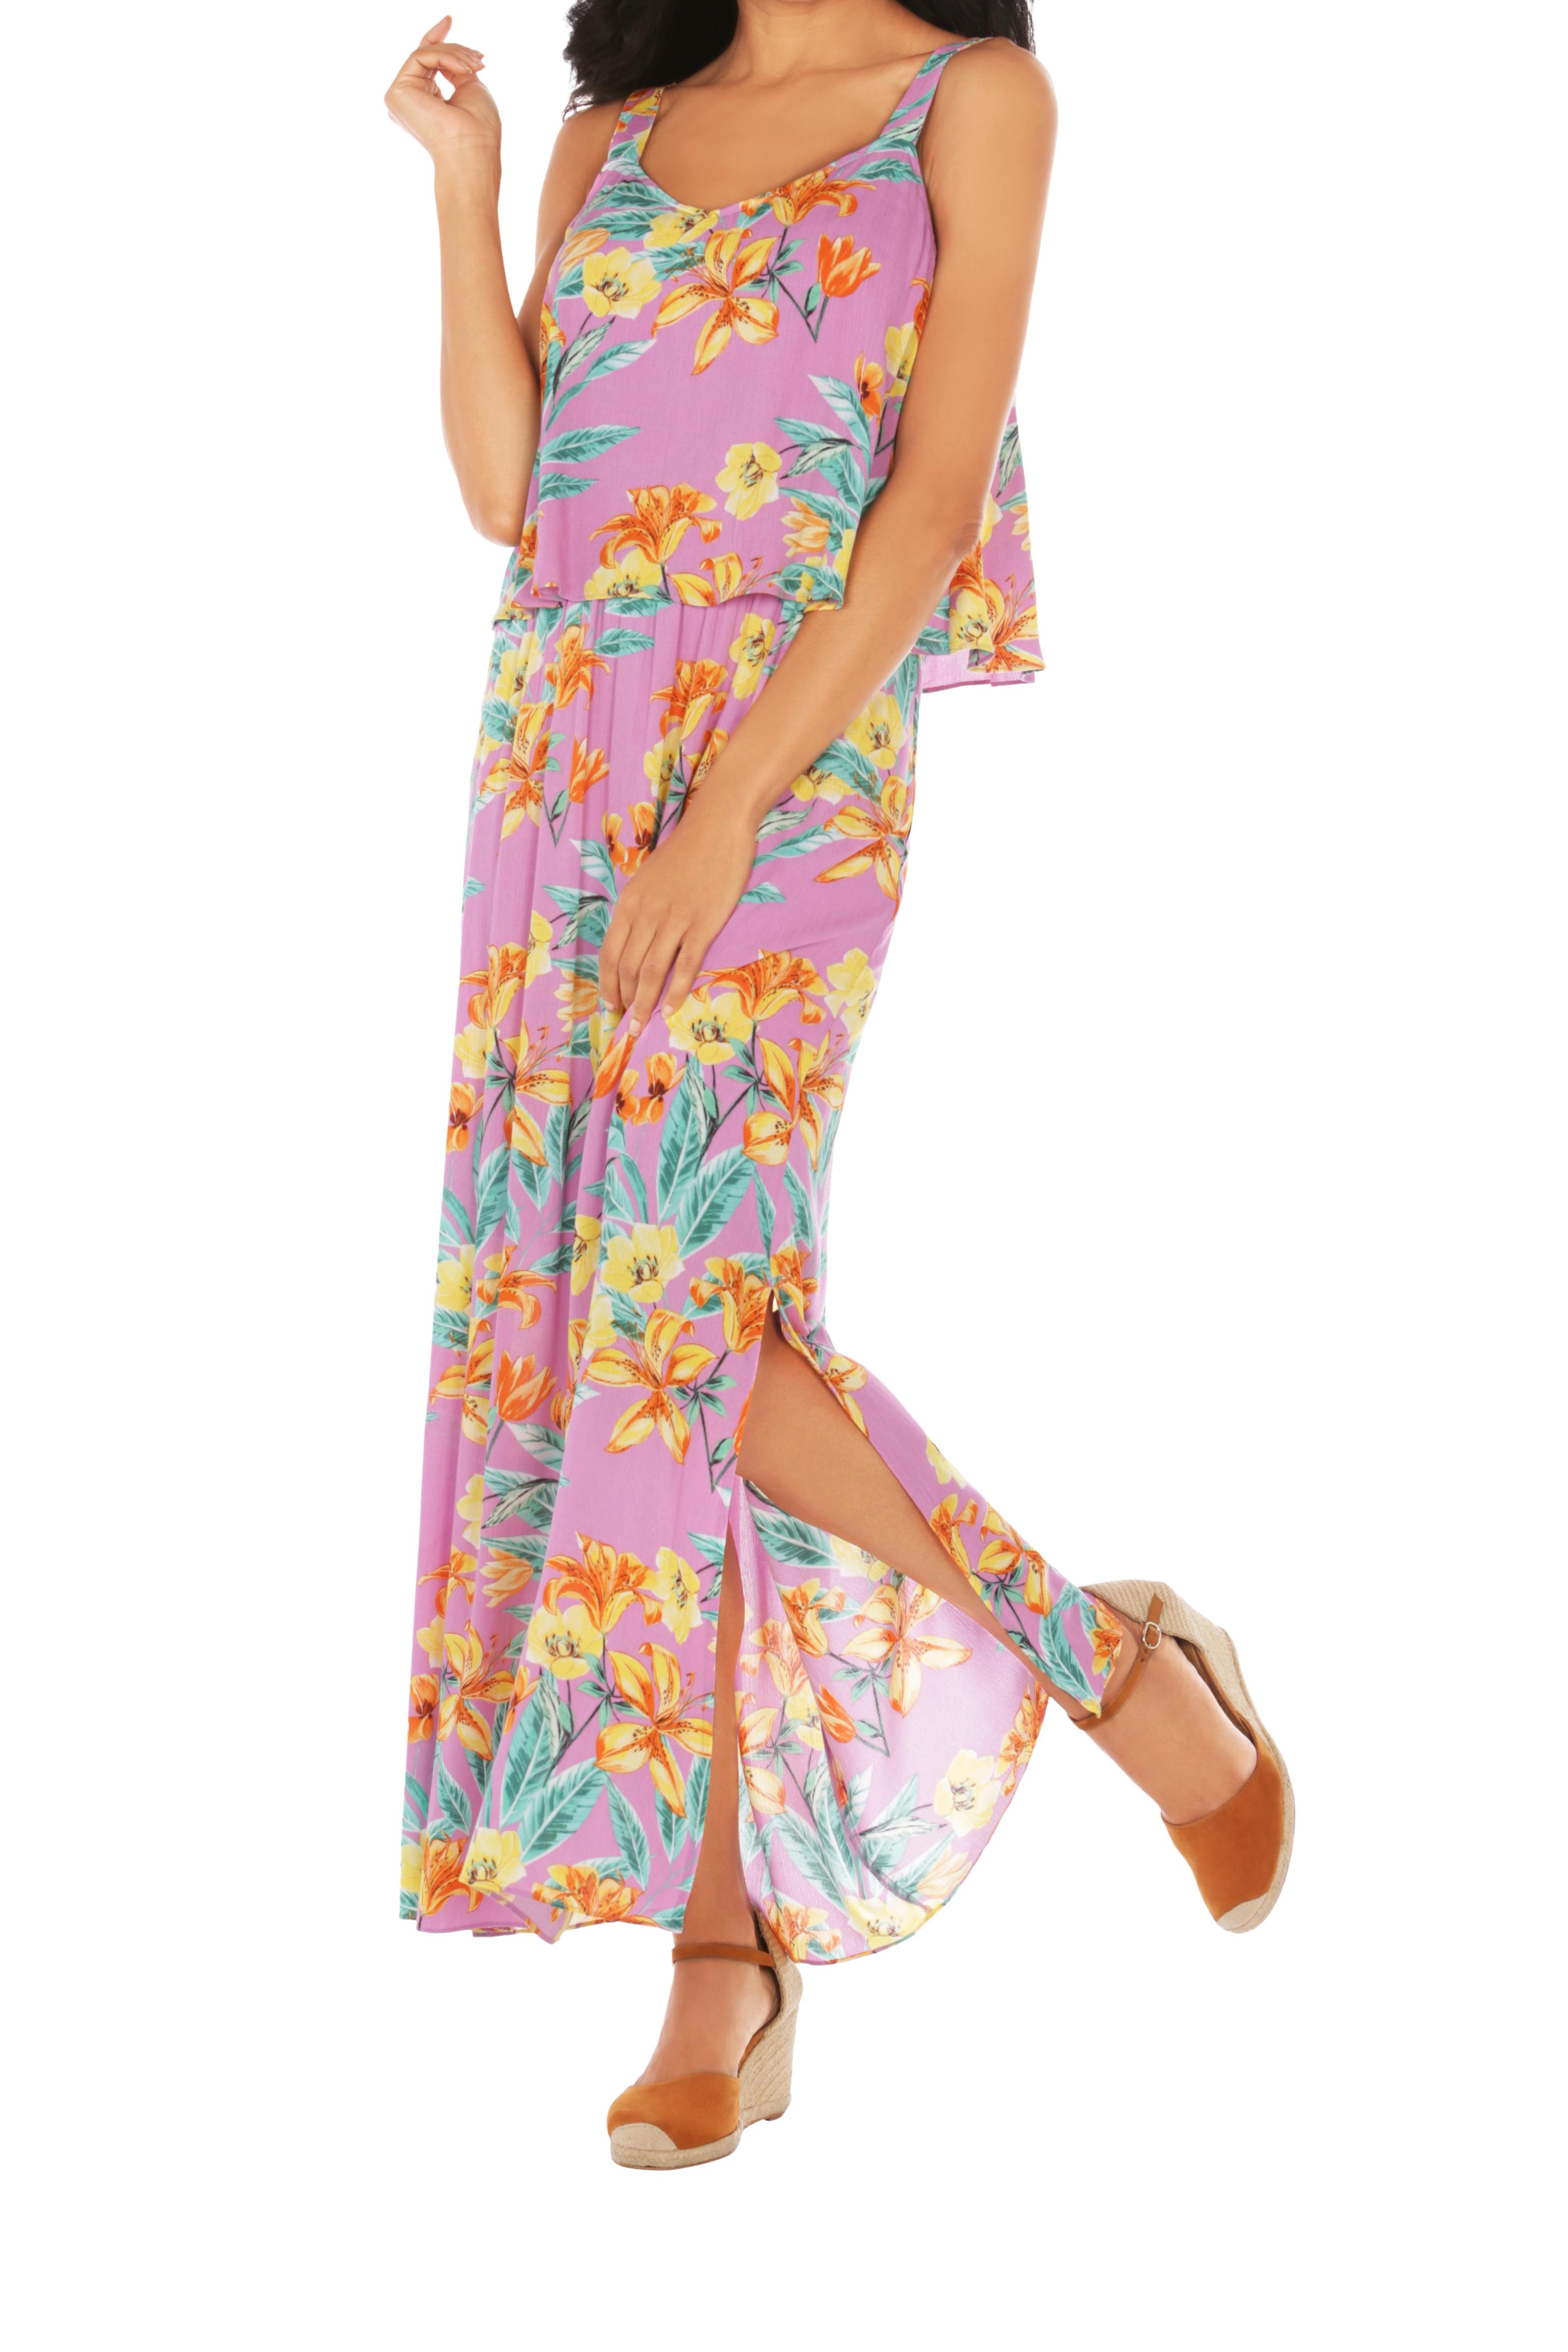 Caribbean Joe® Double Layer Maxi Dress -Pink - Front